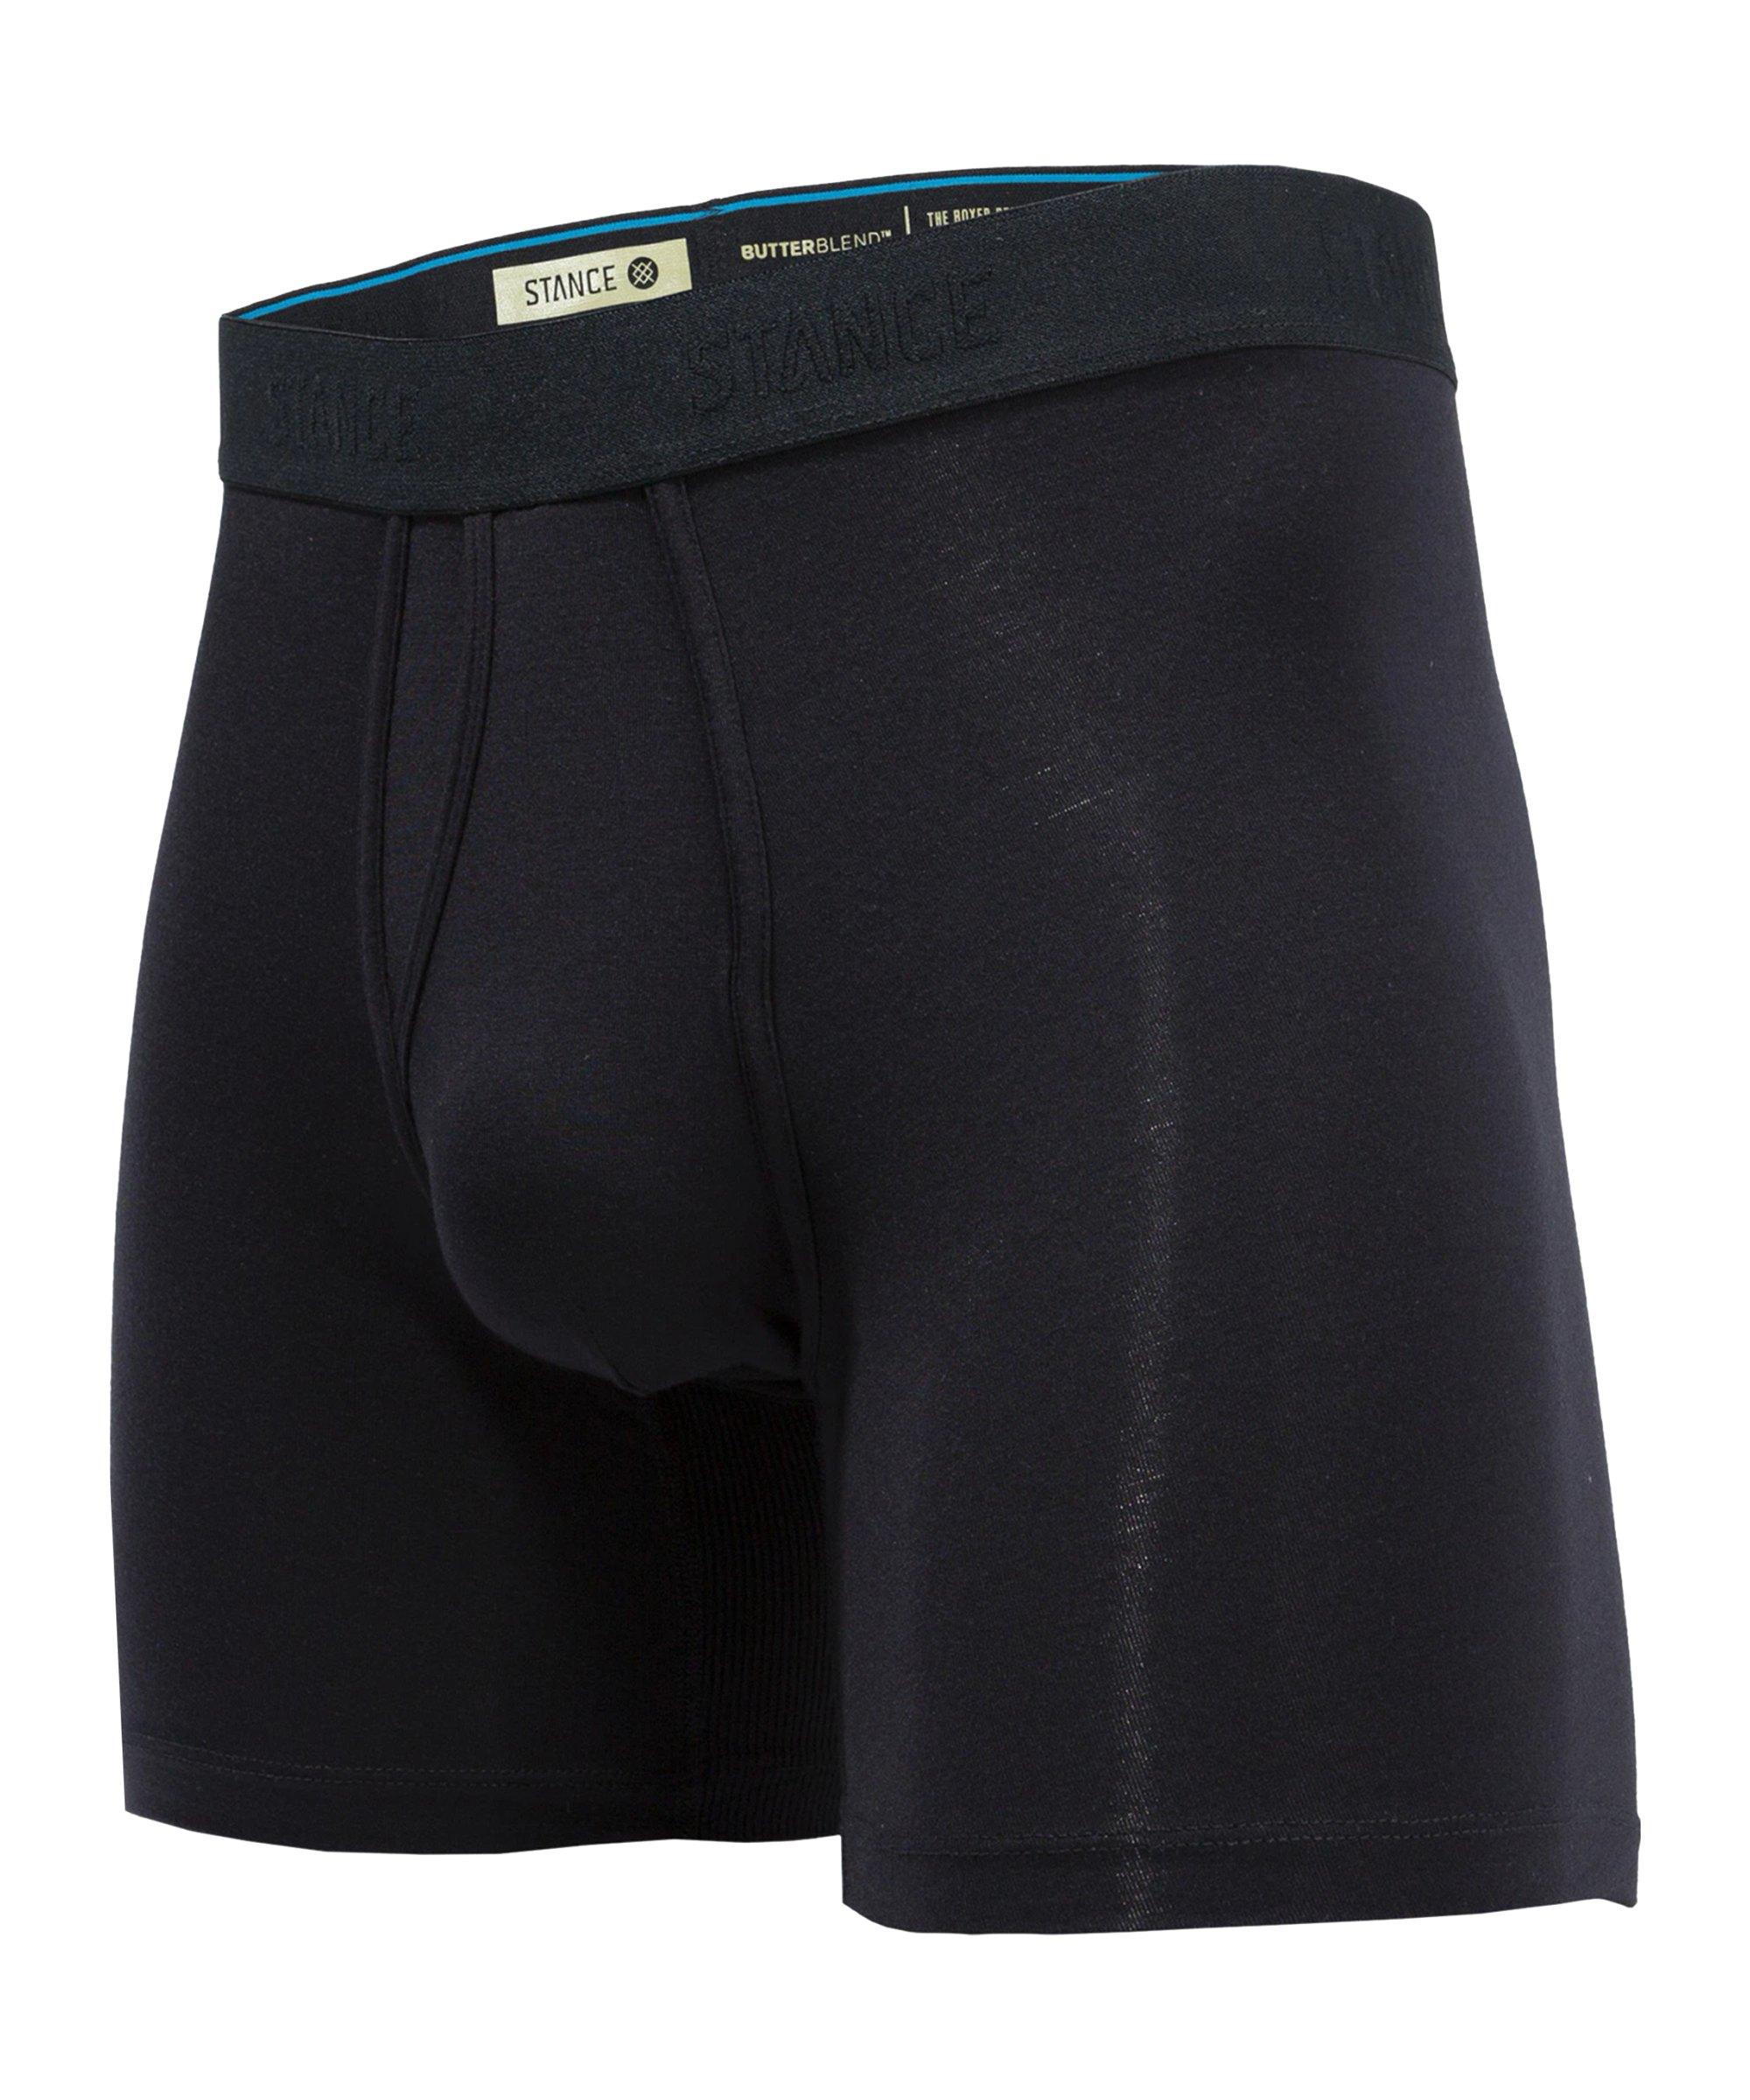 Stance Standard Brief Boxershort 2er Pack FMUL - schwarz